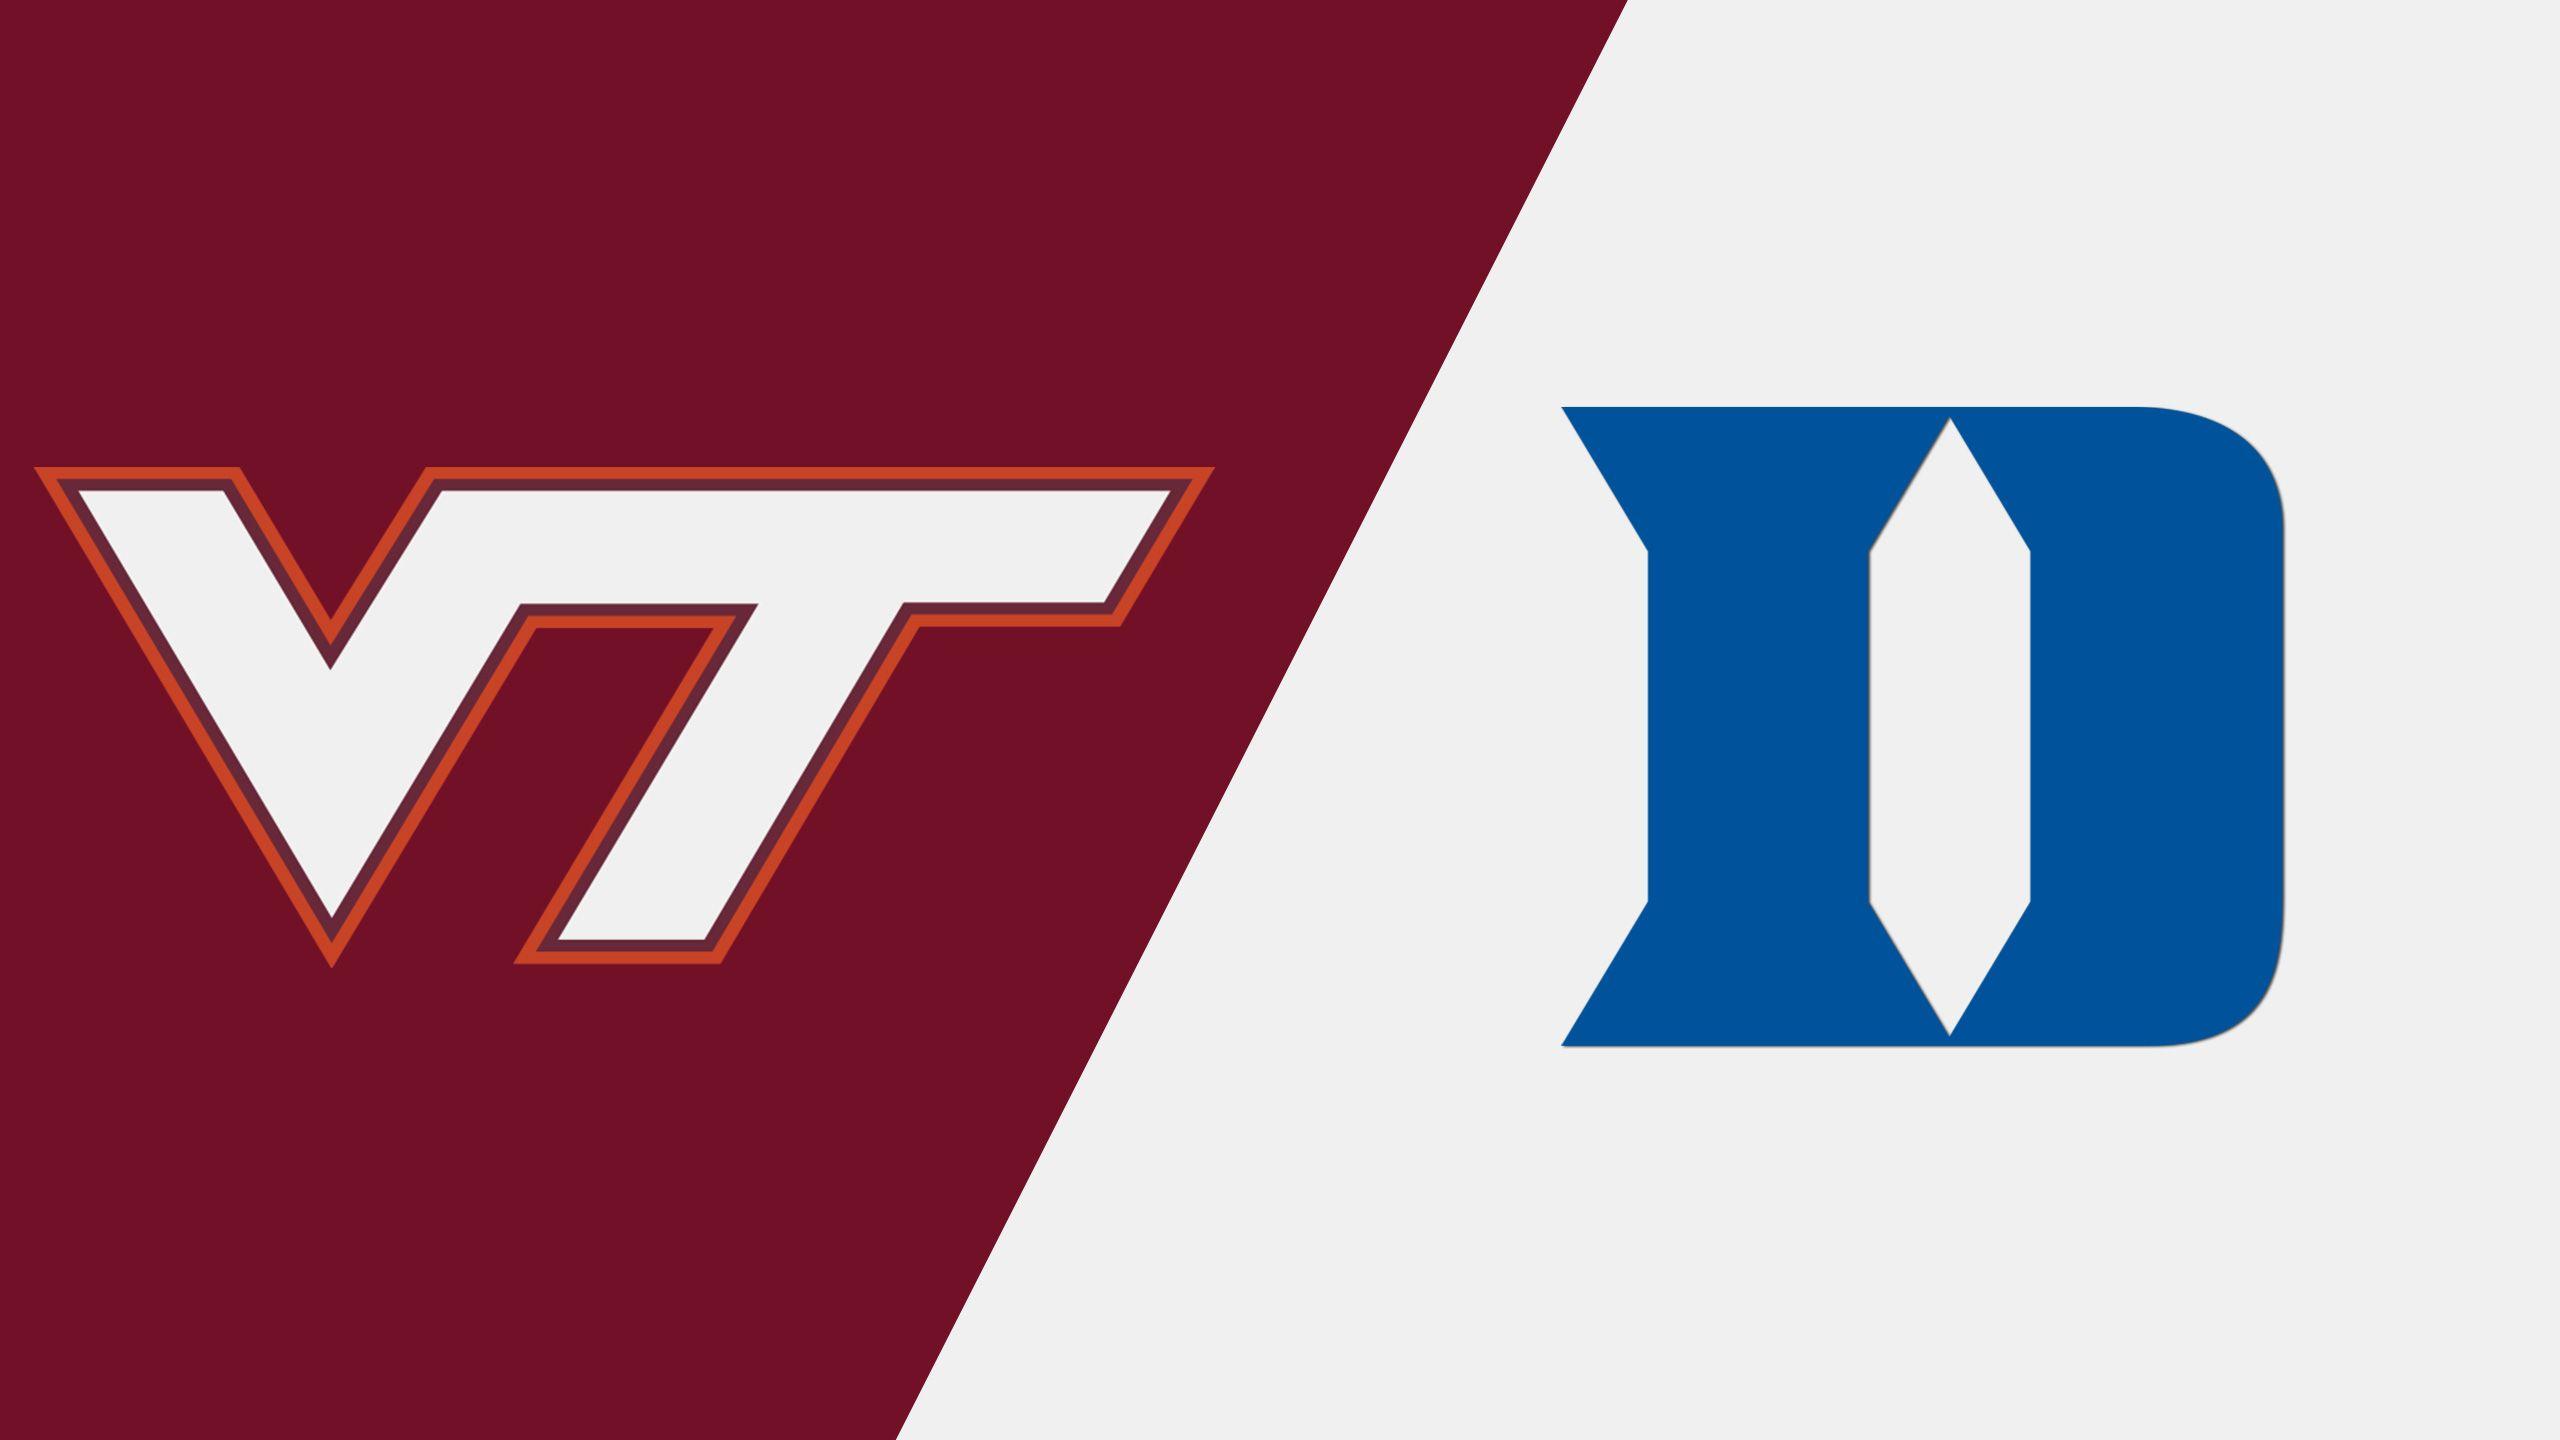 Virginia Tech vs. #12 Duke (M Basketball)